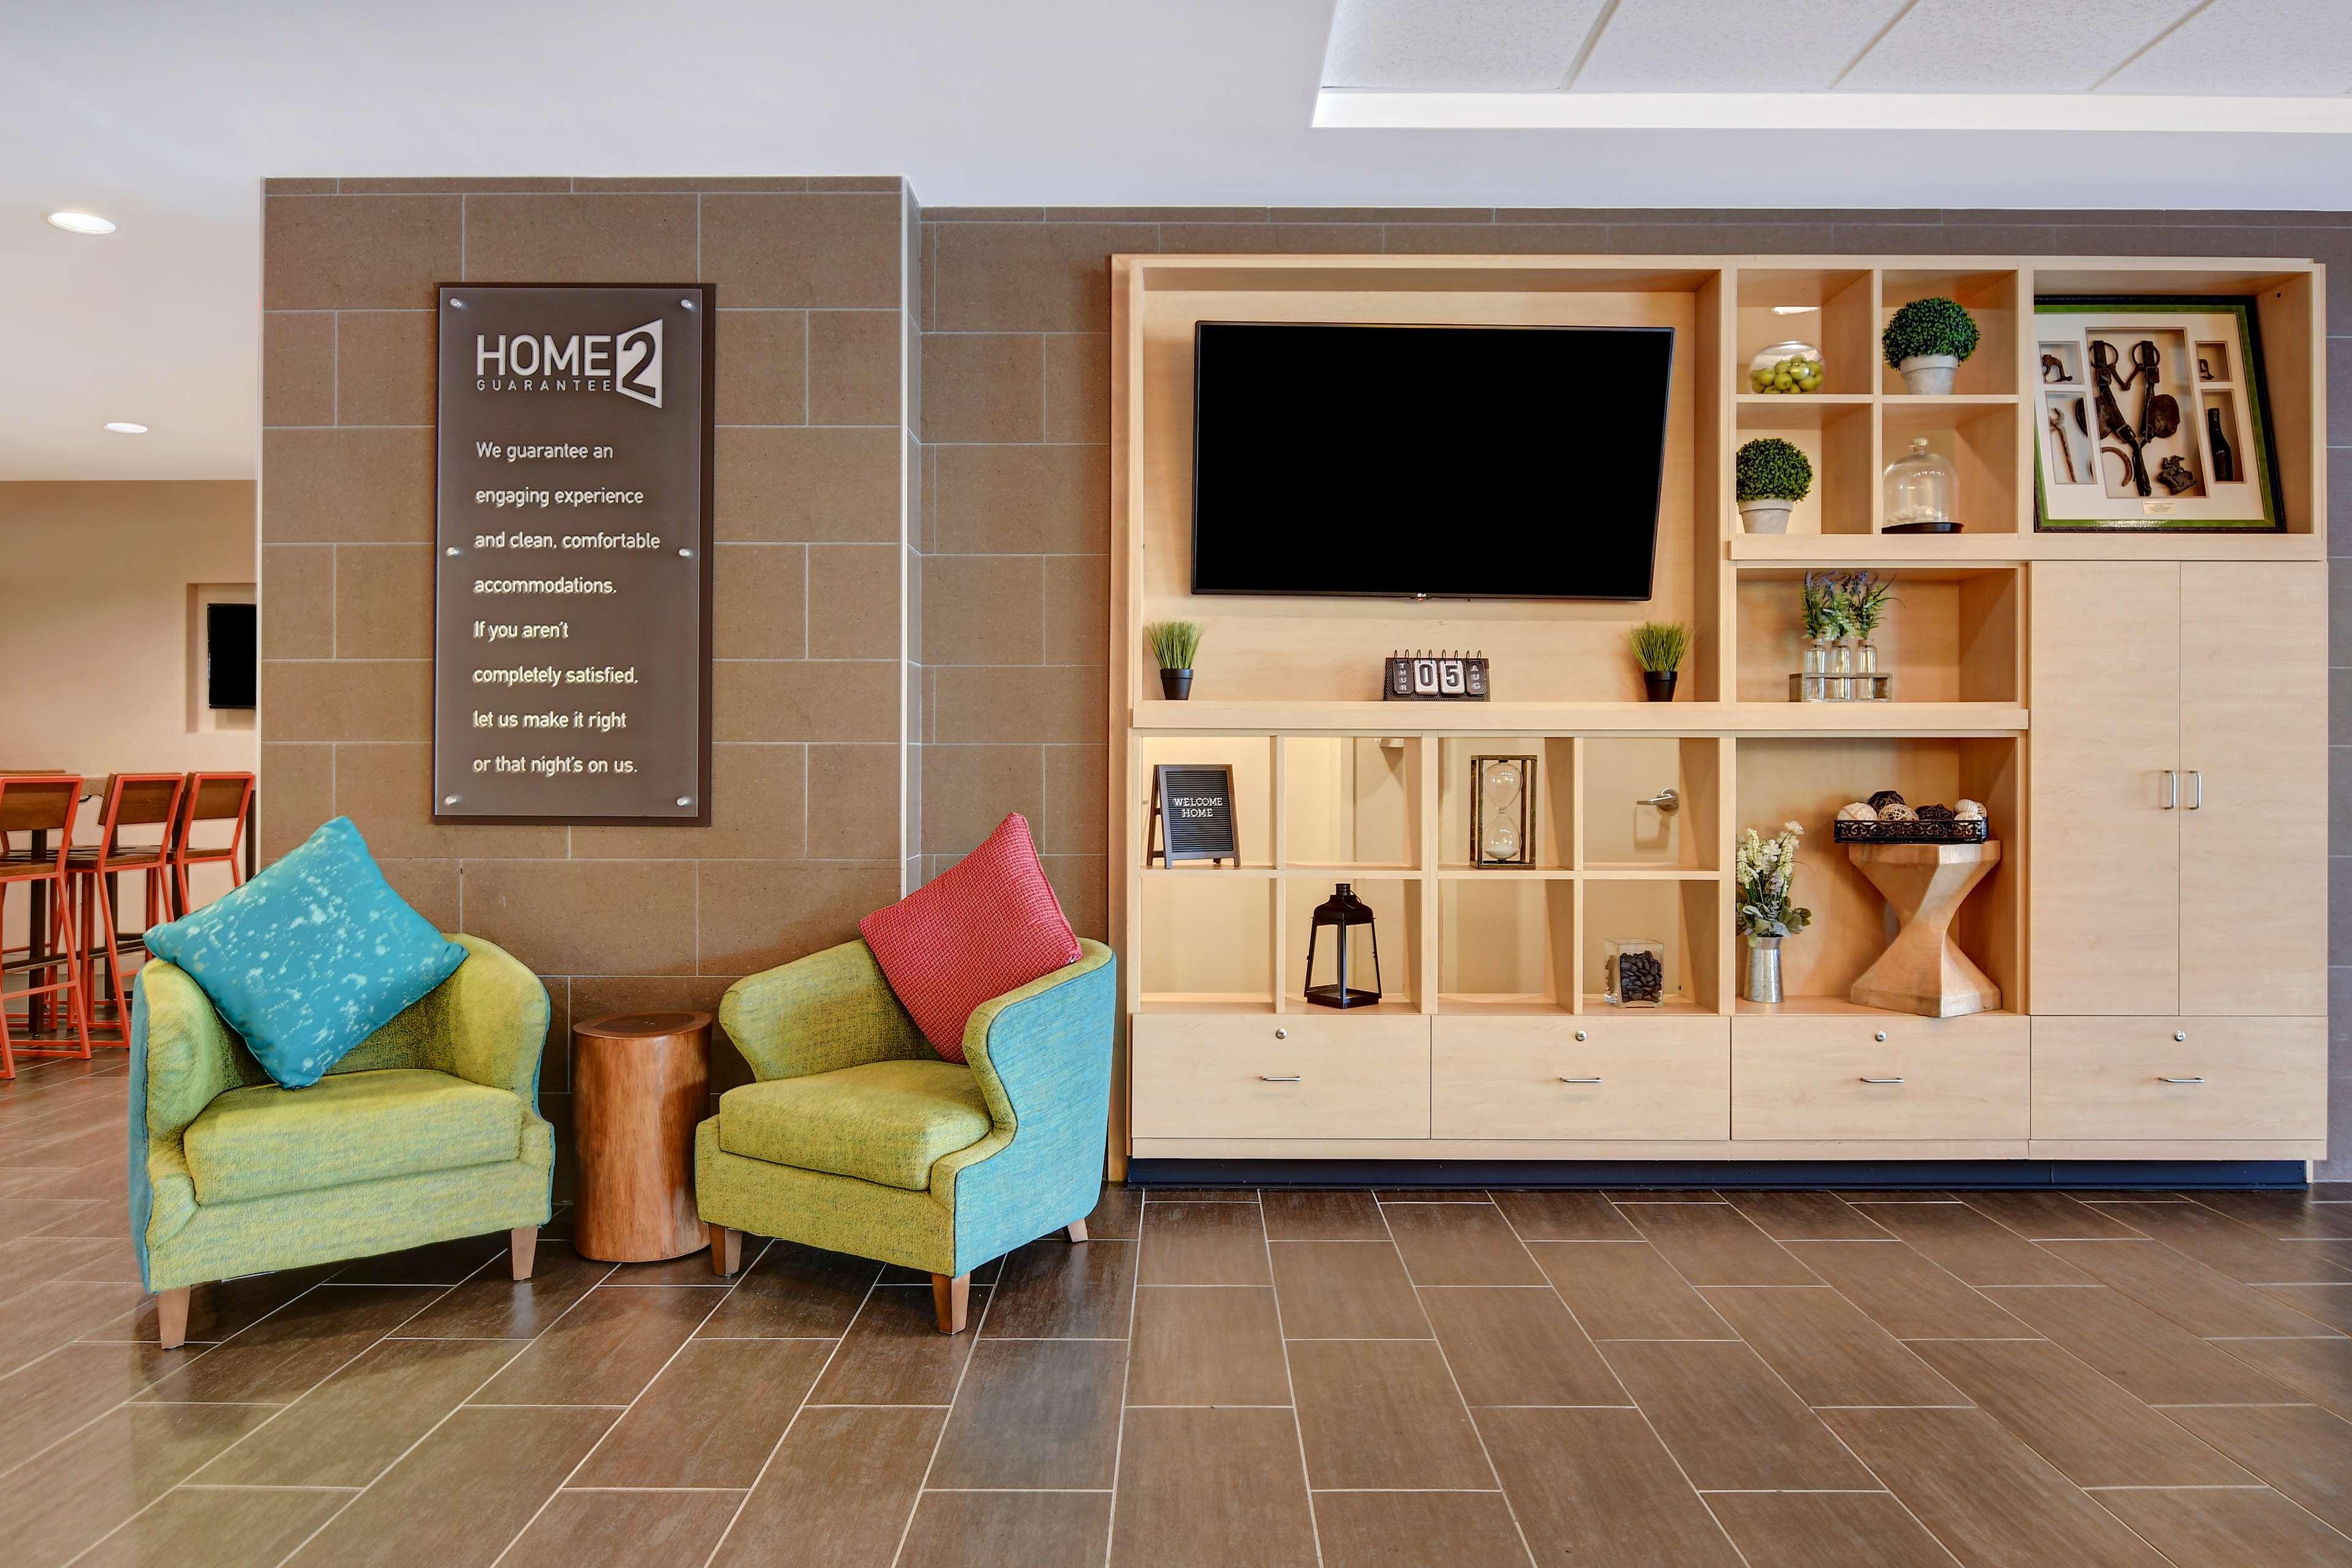 Home2 Suites by Hilton Augusta,GA